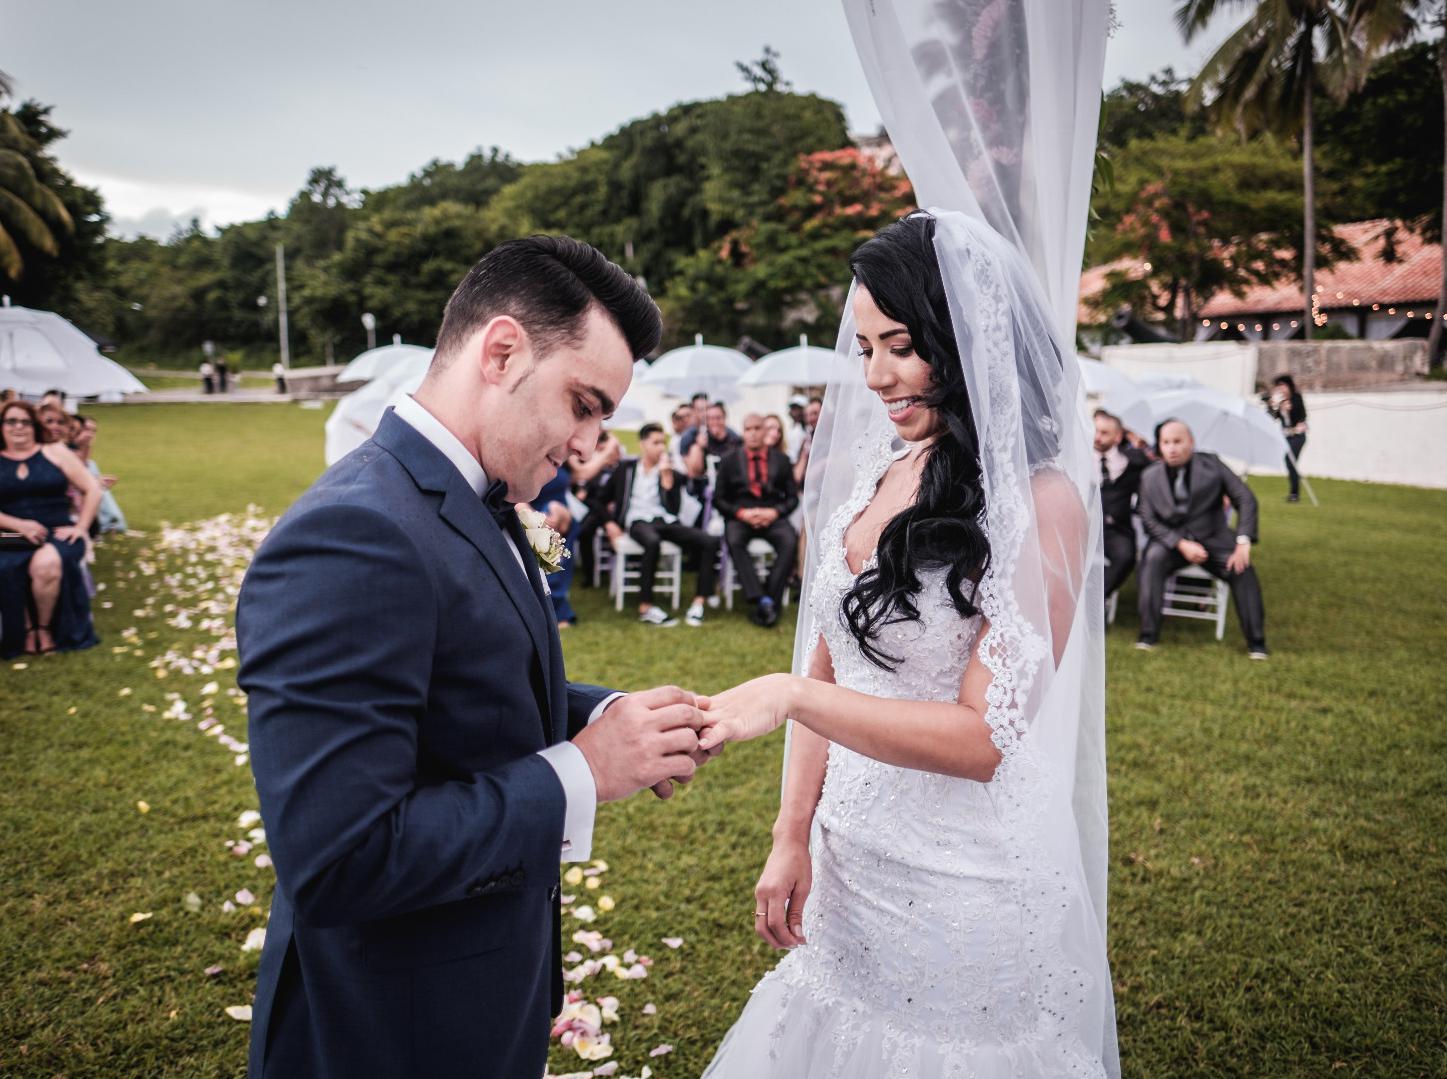 bodas-sin-clasificar-sin-tema-cuba-35602.jpg